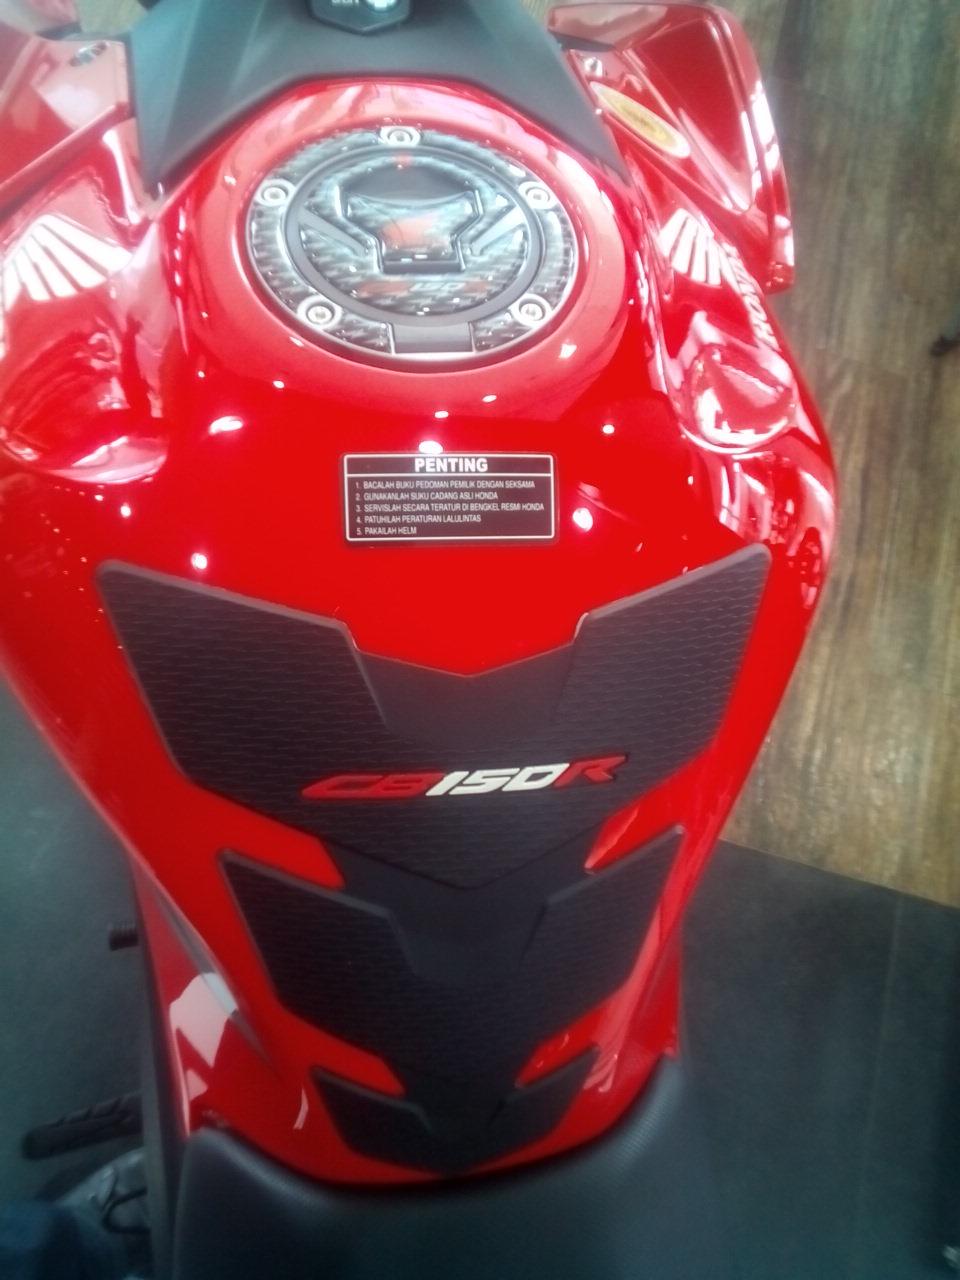 108 Aksesoris Modifikasi Motor Cb 150 R Honda All New 150r Streetfire Wild Black Depok Jual Cb150r Jum Bikers Shop Tokopedia